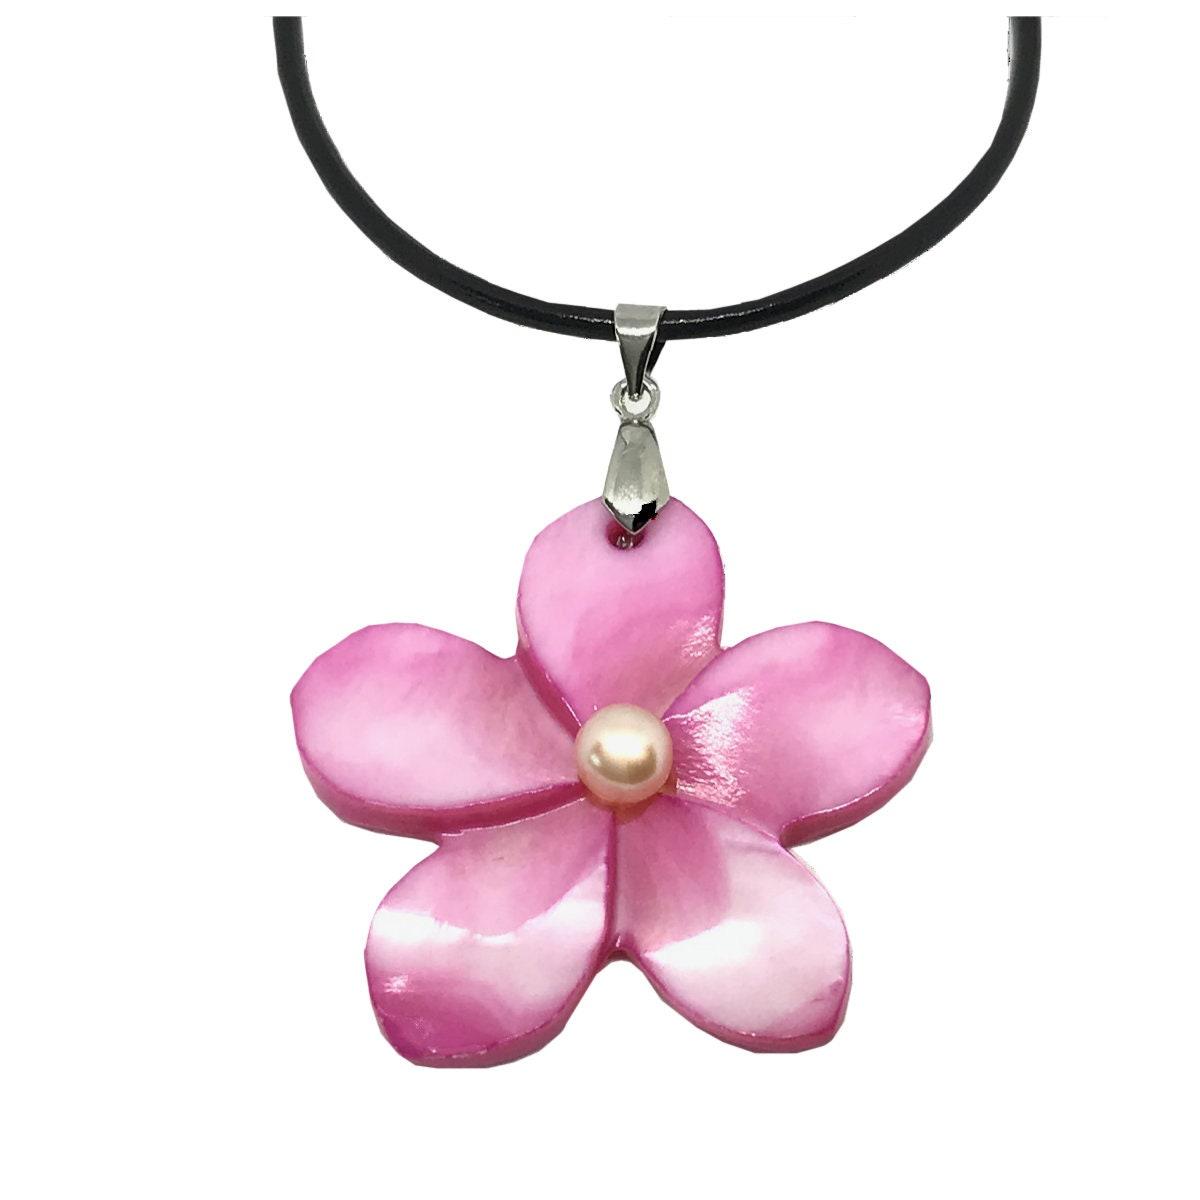 Hawaiian Jewelry Handmade Pink Shell Plumeria Flower Necklace Etsy